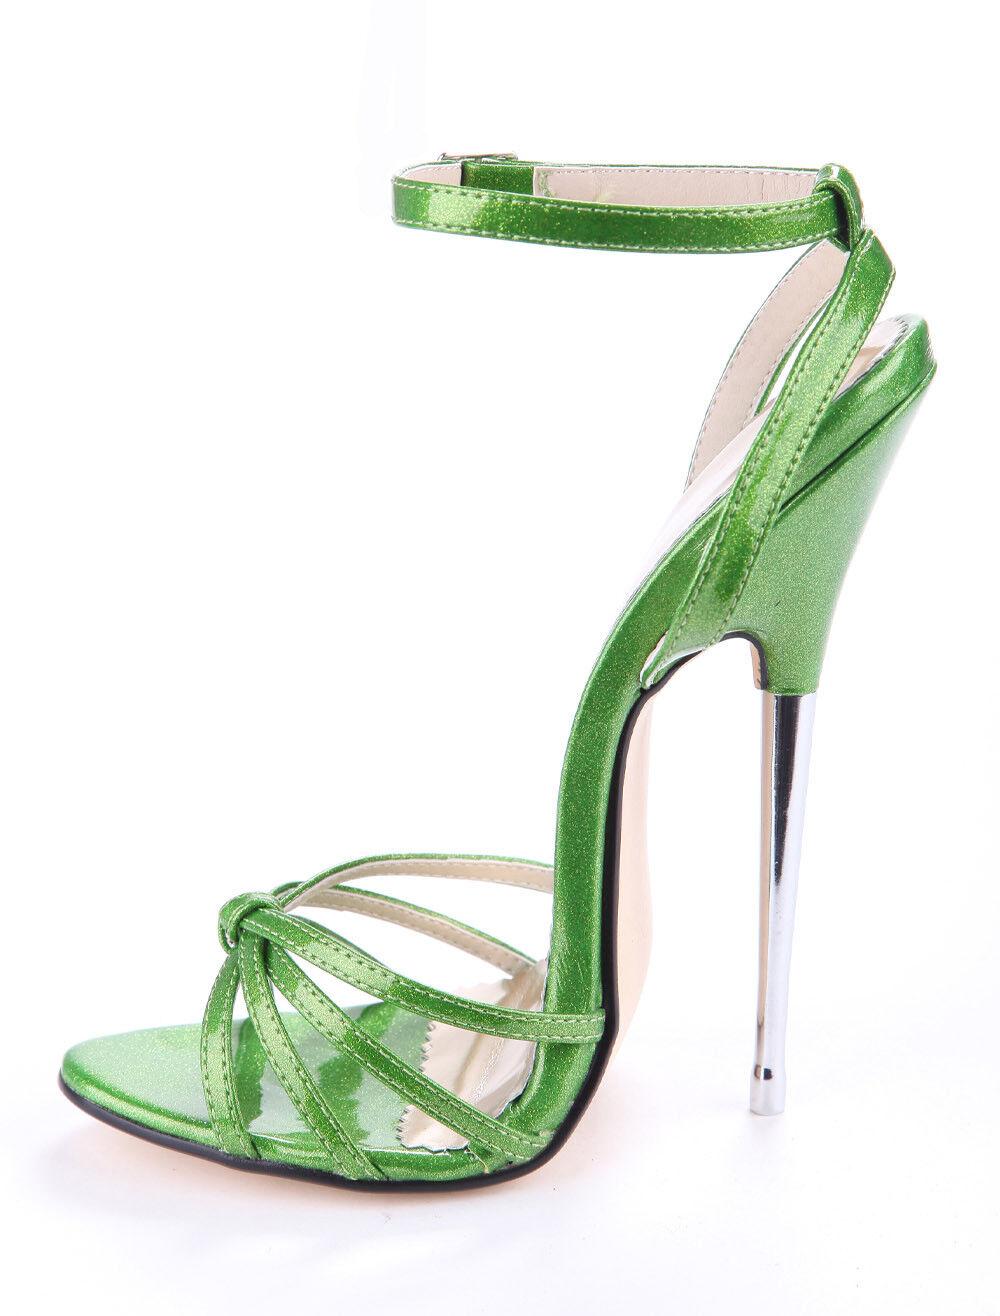 6.24'' 16cm Super High Heels Party Club Wouomo Peep Toe Sexy Stilettos scarpe